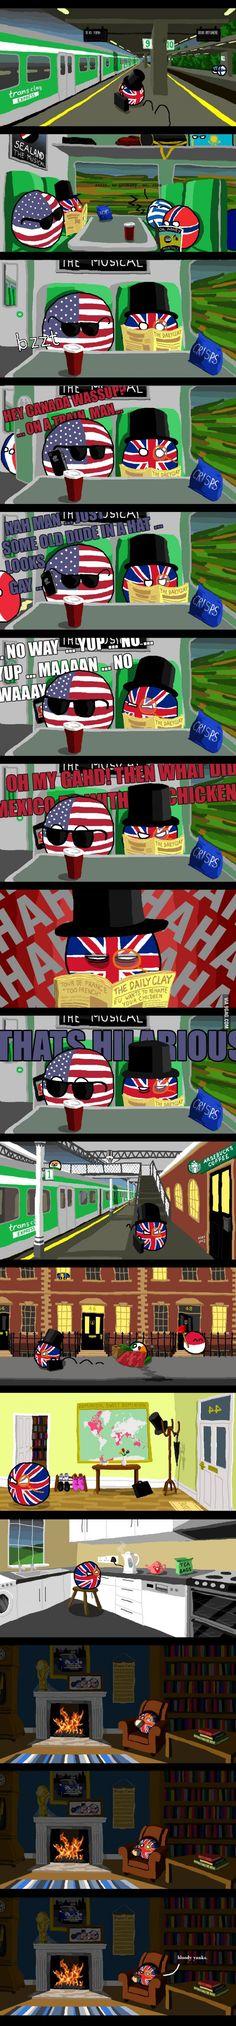 """please keep quiet on the train"" ( UK, USA, Greece, Ireland, Poland ) by arrz  #polandball #countryball #flagball"